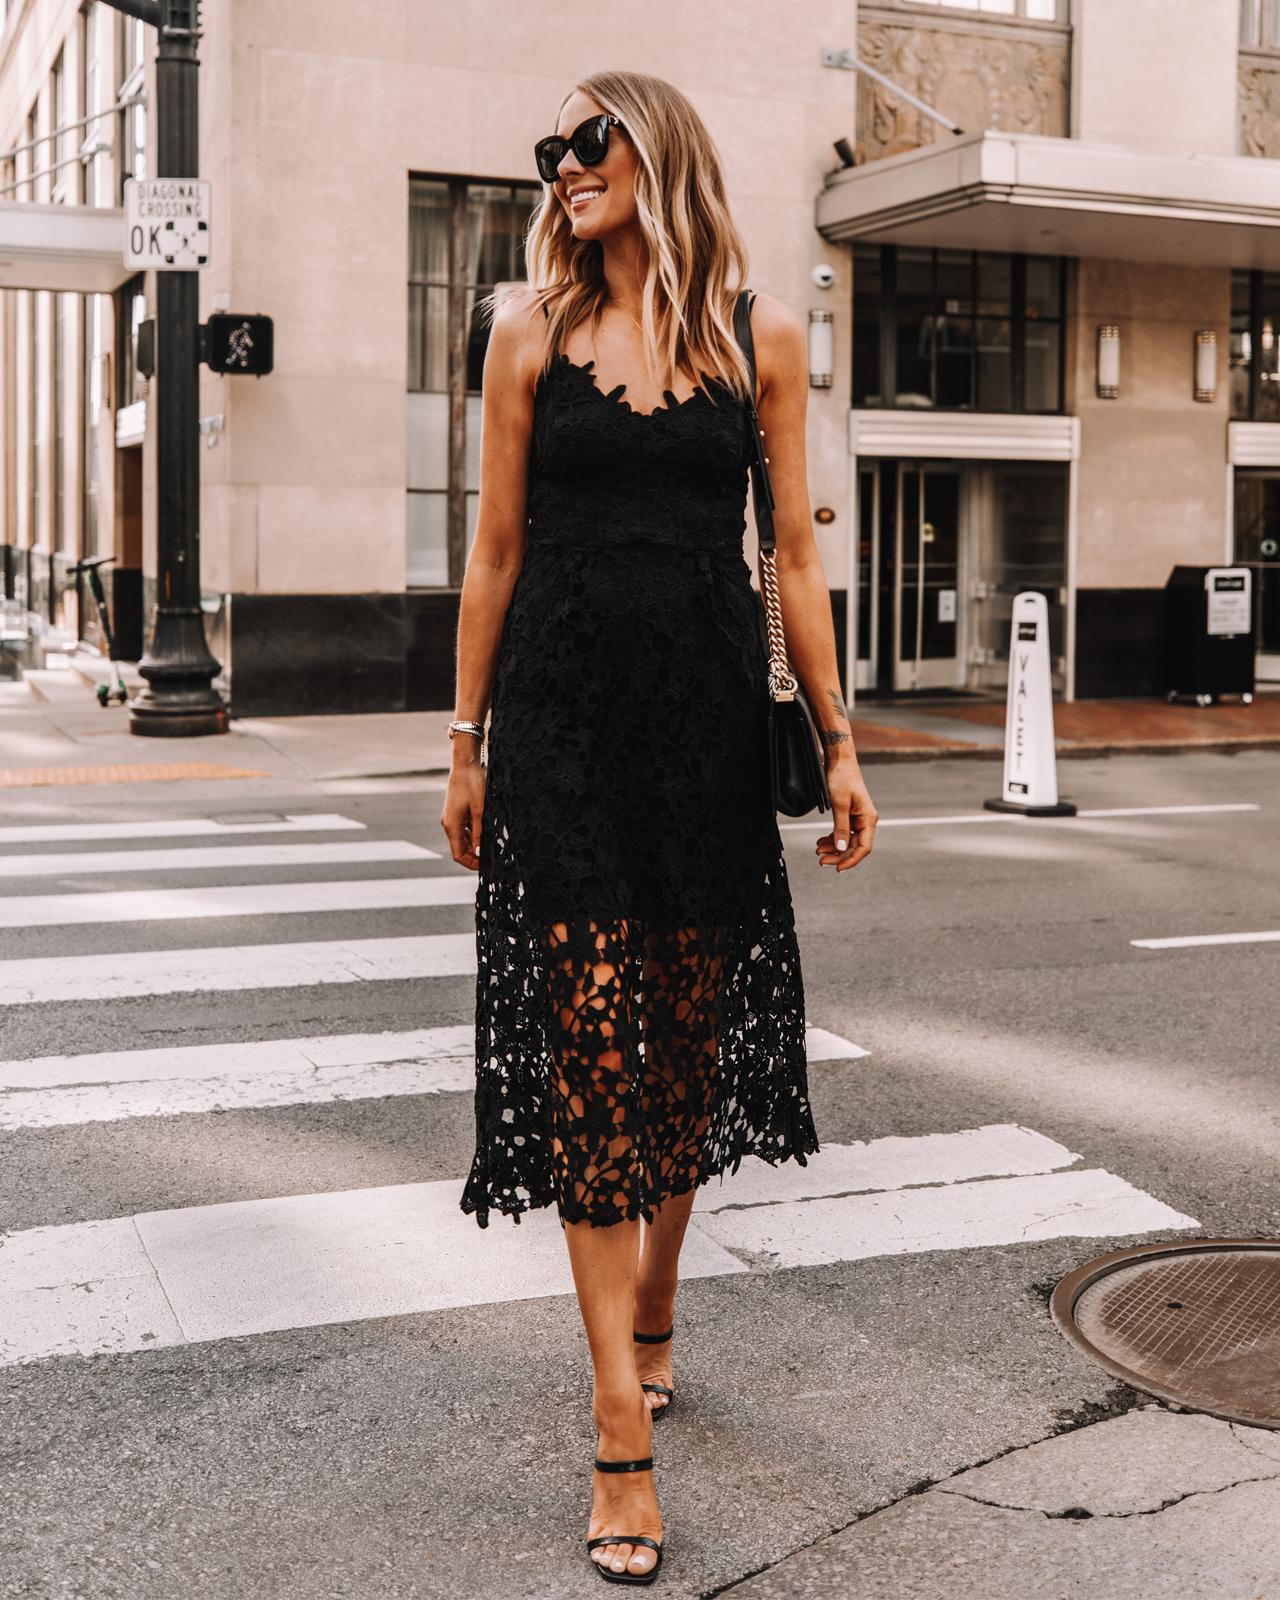 Fashion Jackson Wearing Express Black Lace Midi Dress Black Heeled Sandals